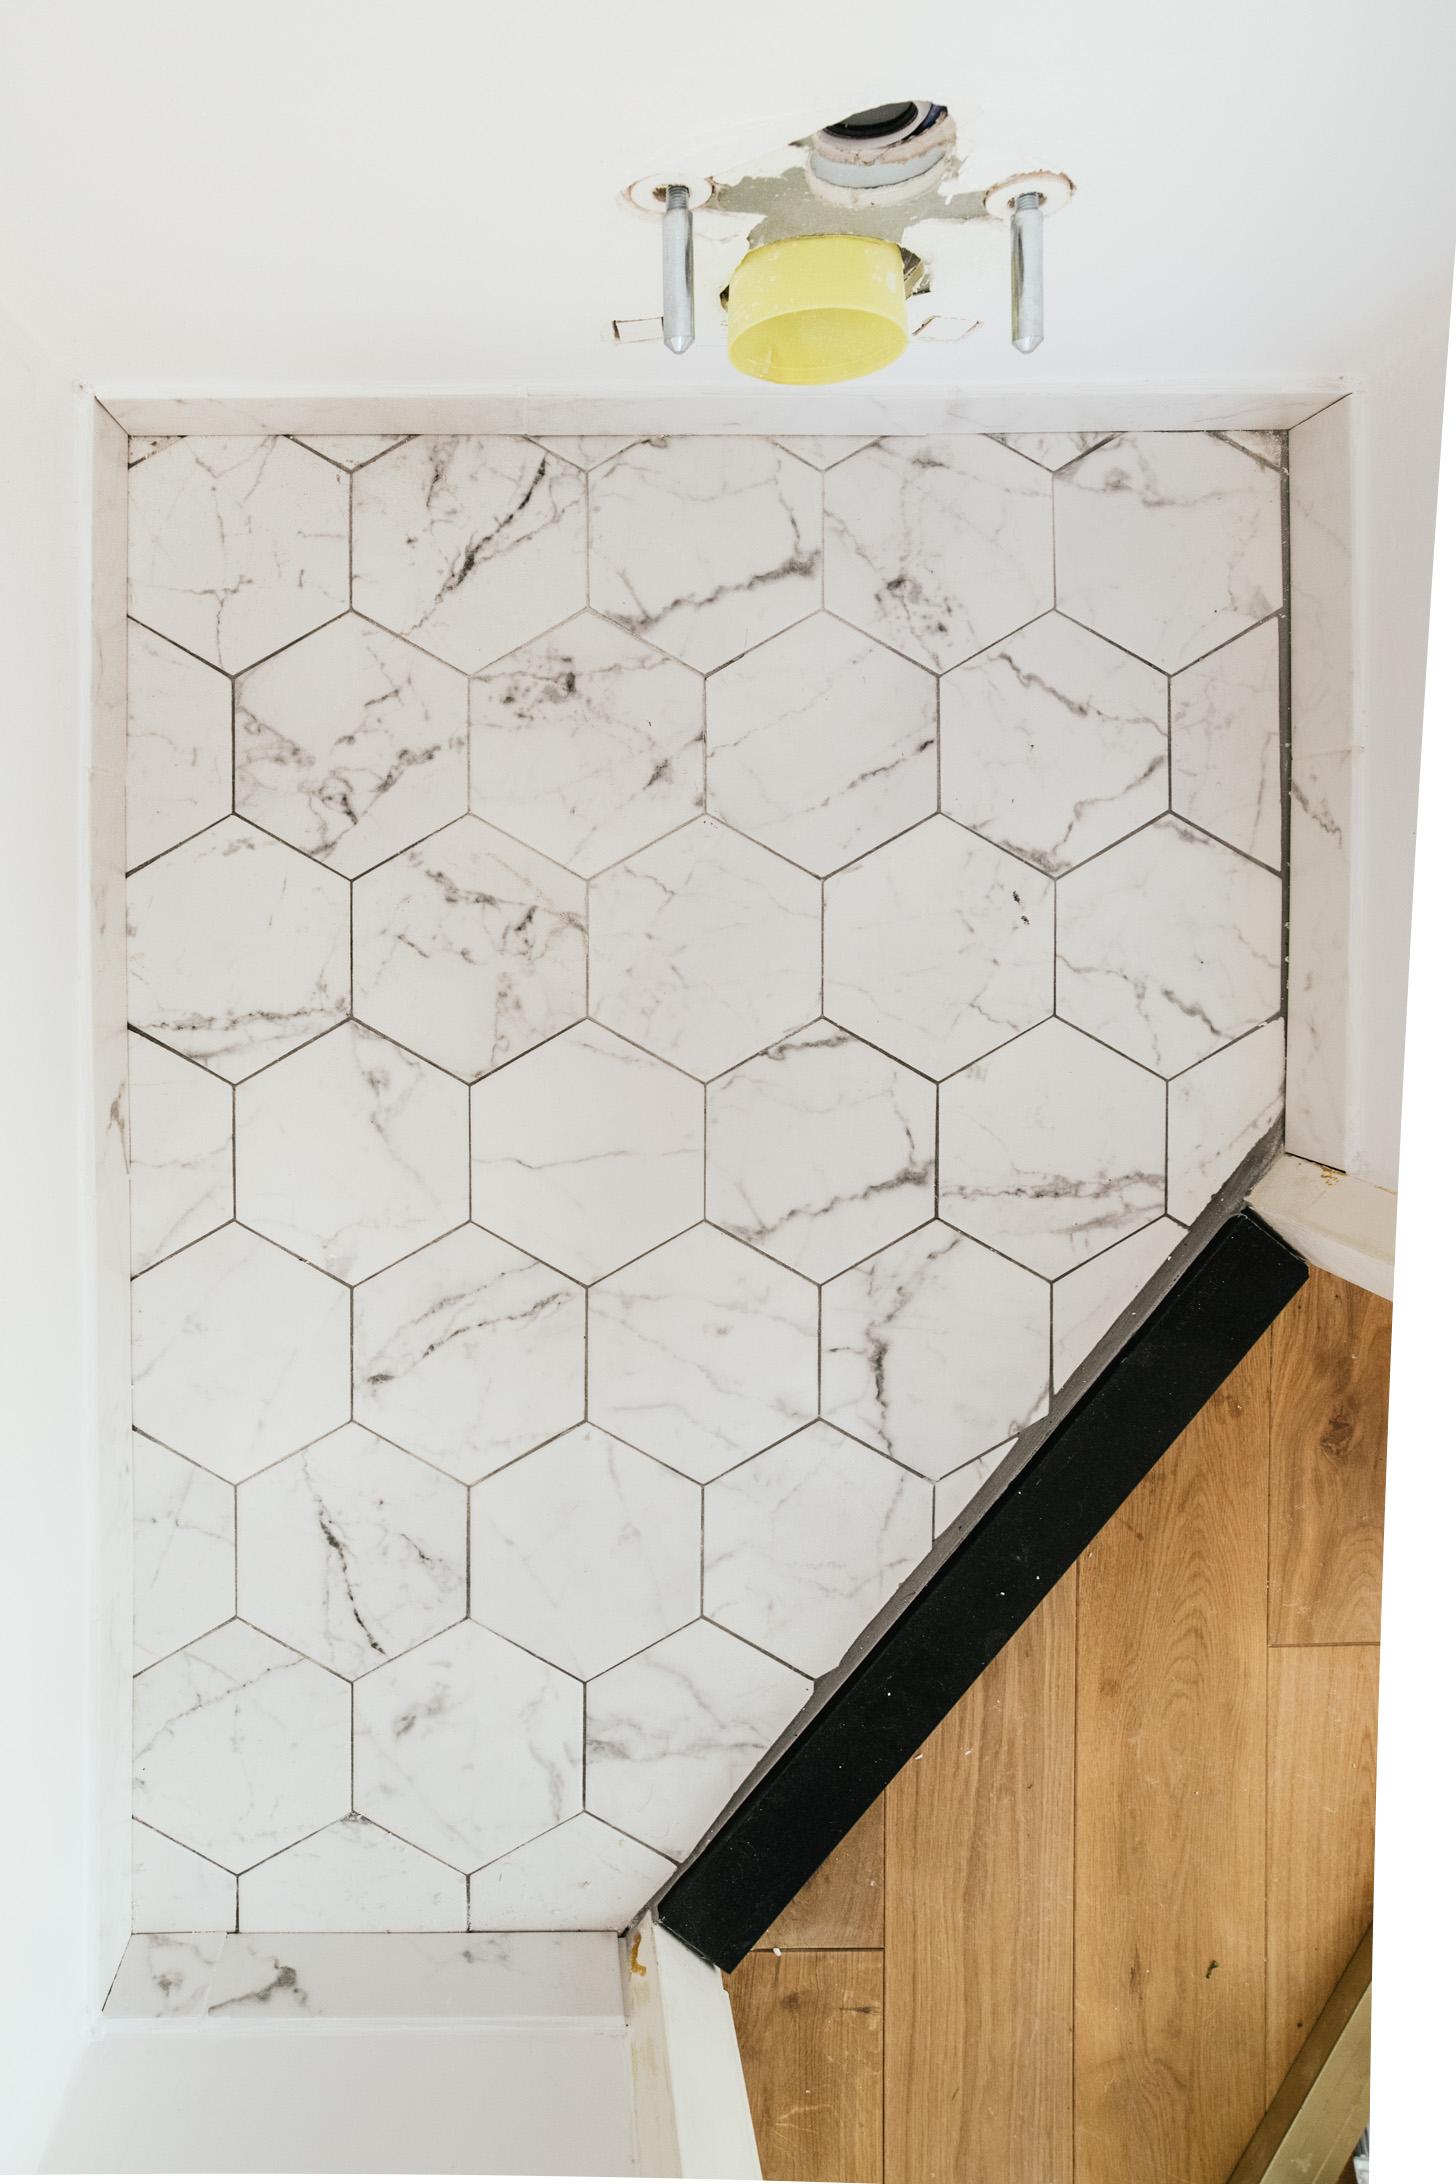 Hoe Leg Je Hexagon Tegels Honingraat Vloer A Cup Of Life